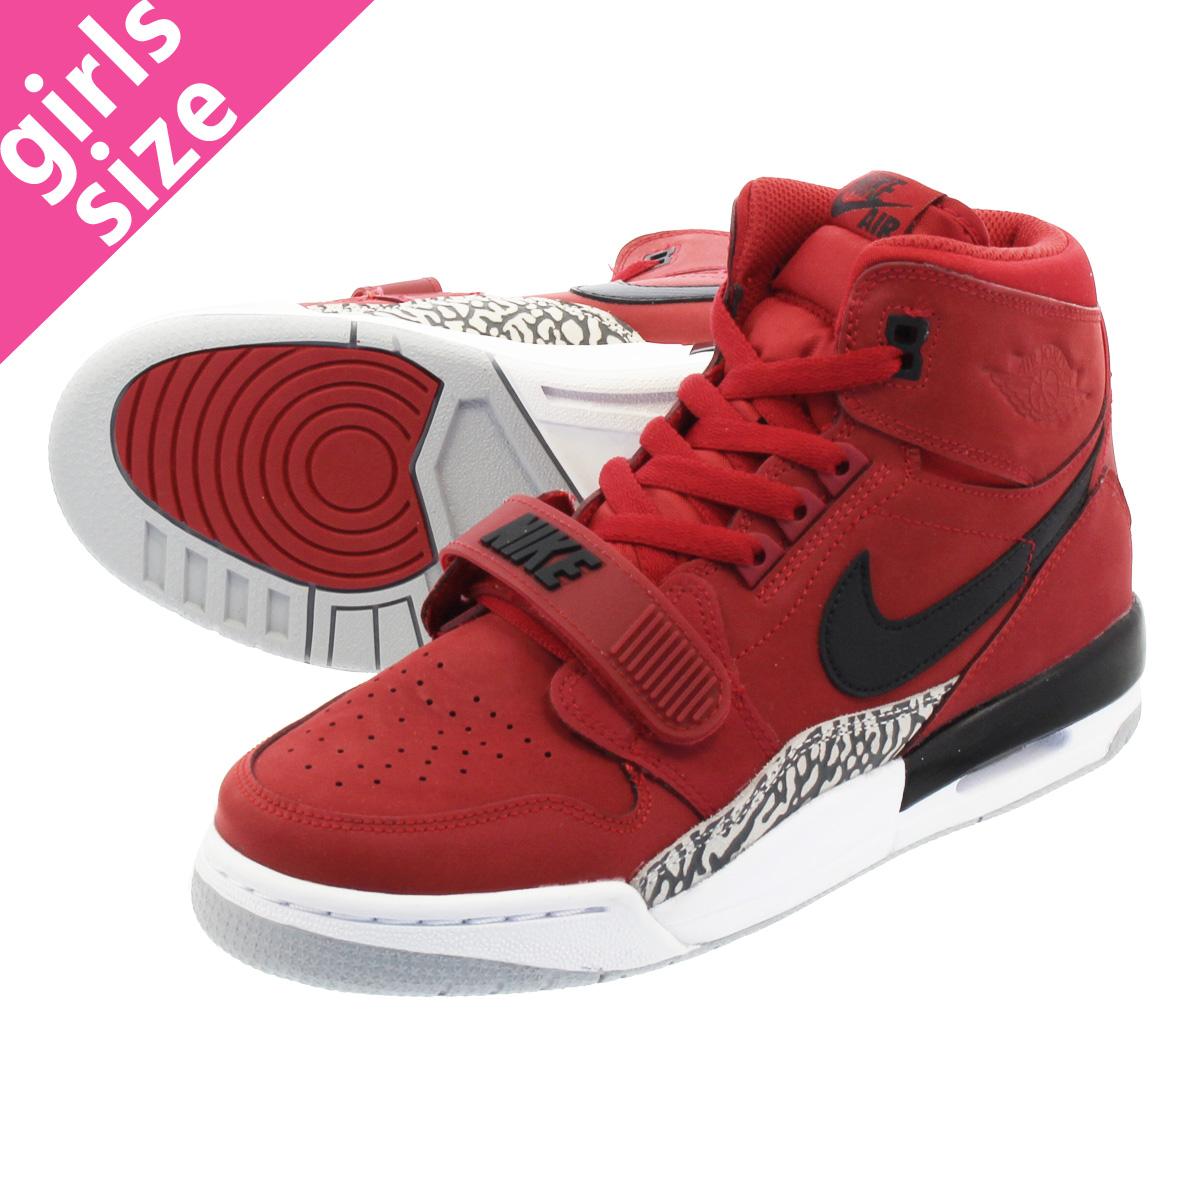 8080d659b512cc NIKE AIR JORDAN LEGACY 312 GS Nike Air Jordan Legacy 312 GS VARSITY  RED BLACK WHITE at4040-601